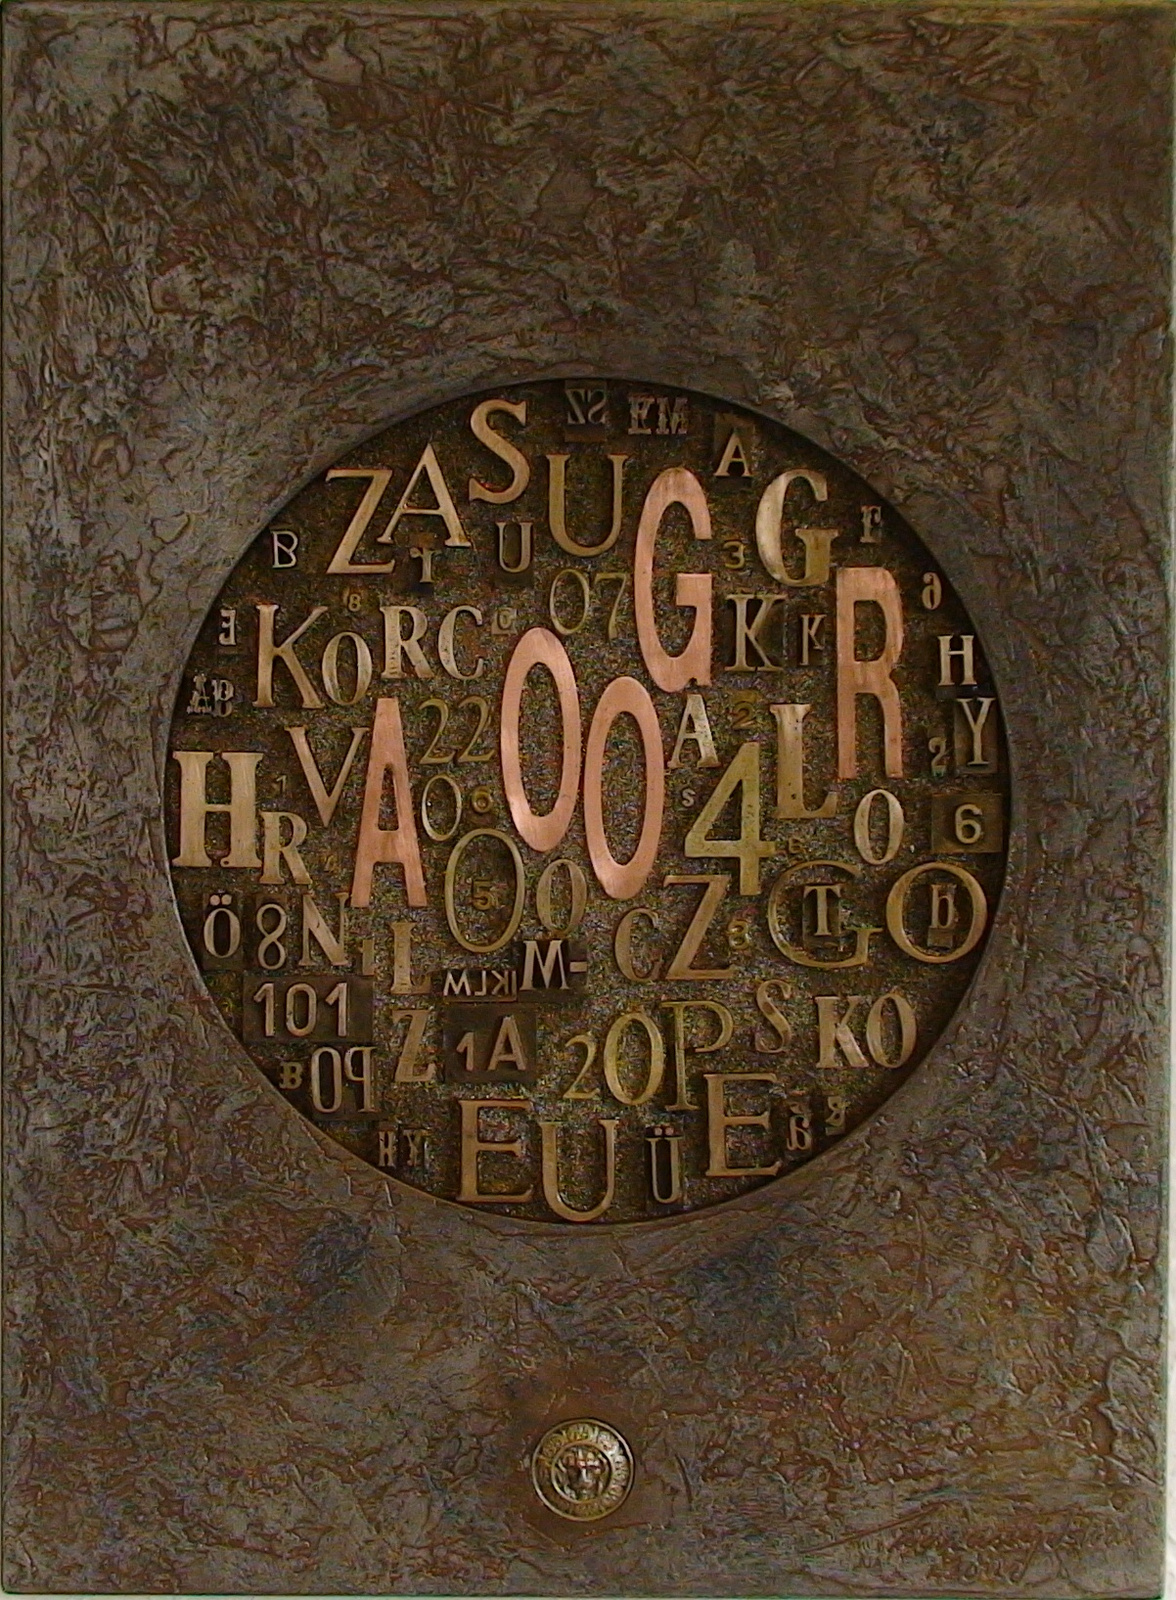 2012 m- (4)